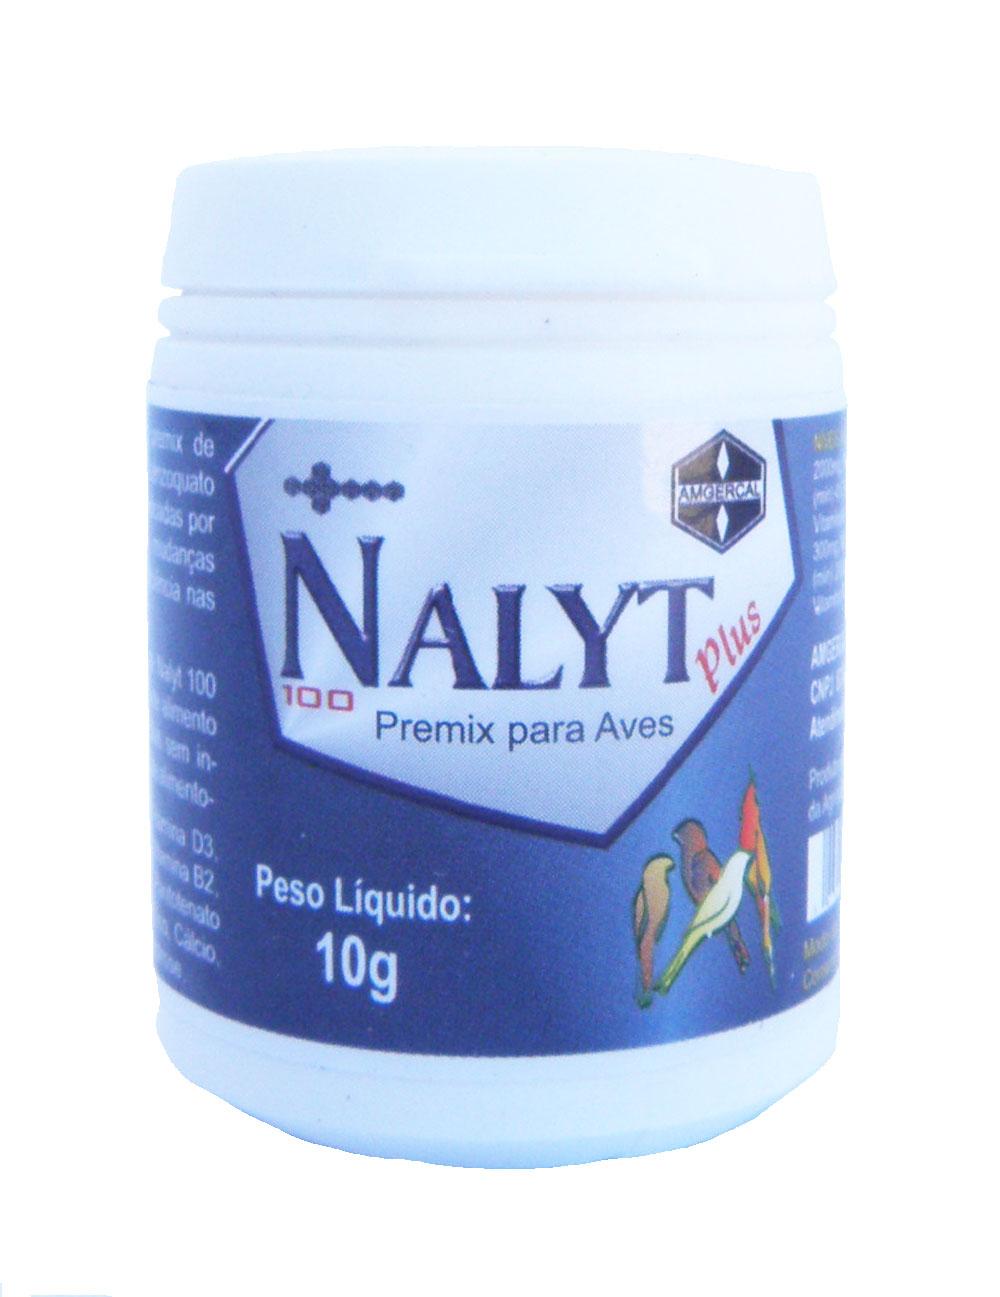 Amgercal - Nalyt 100 Plus - 10G